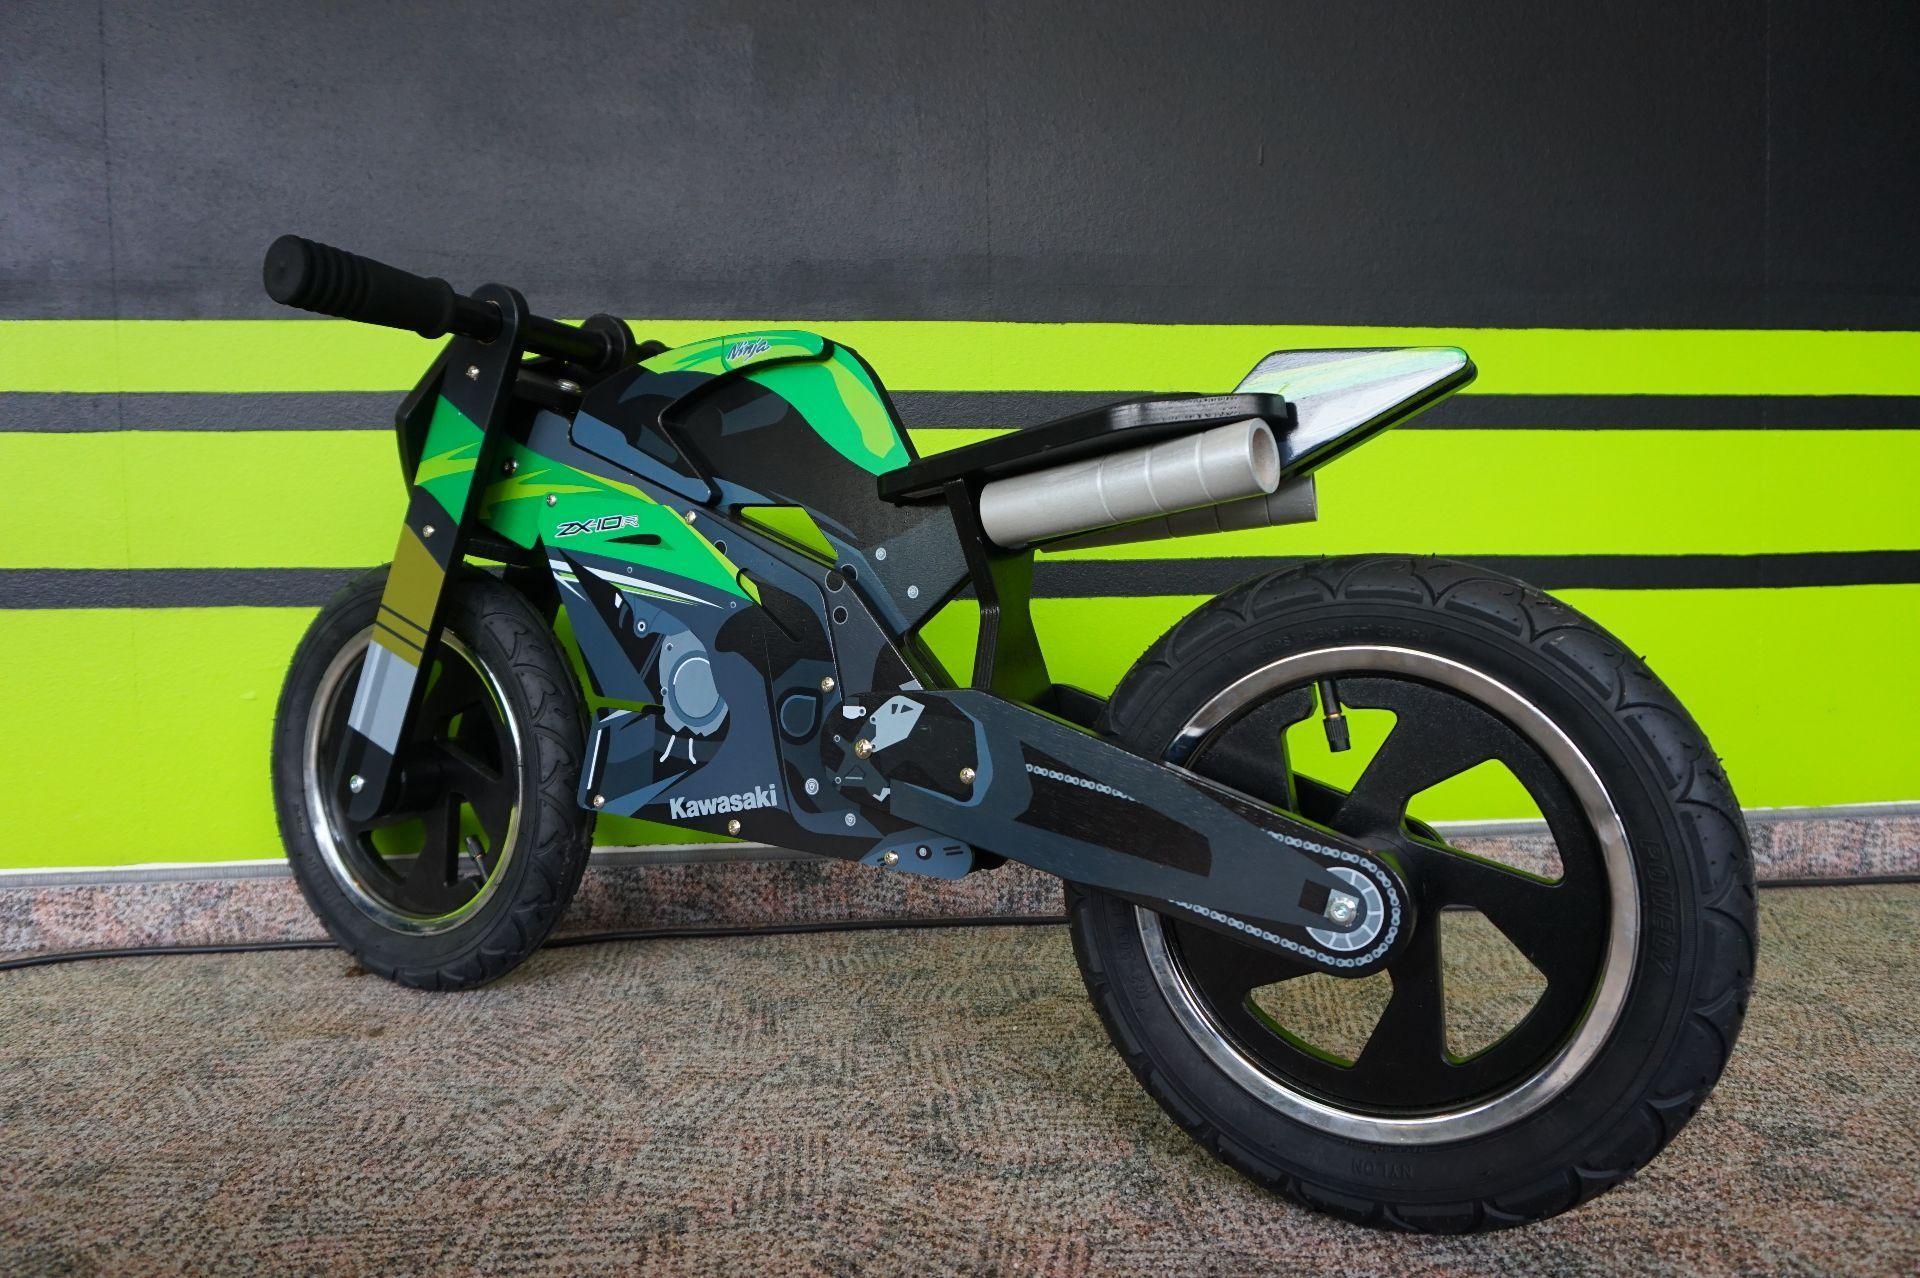 moto neuve acheter kawasaki spezial kiddy moto zx 10r. Black Bedroom Furniture Sets. Home Design Ideas